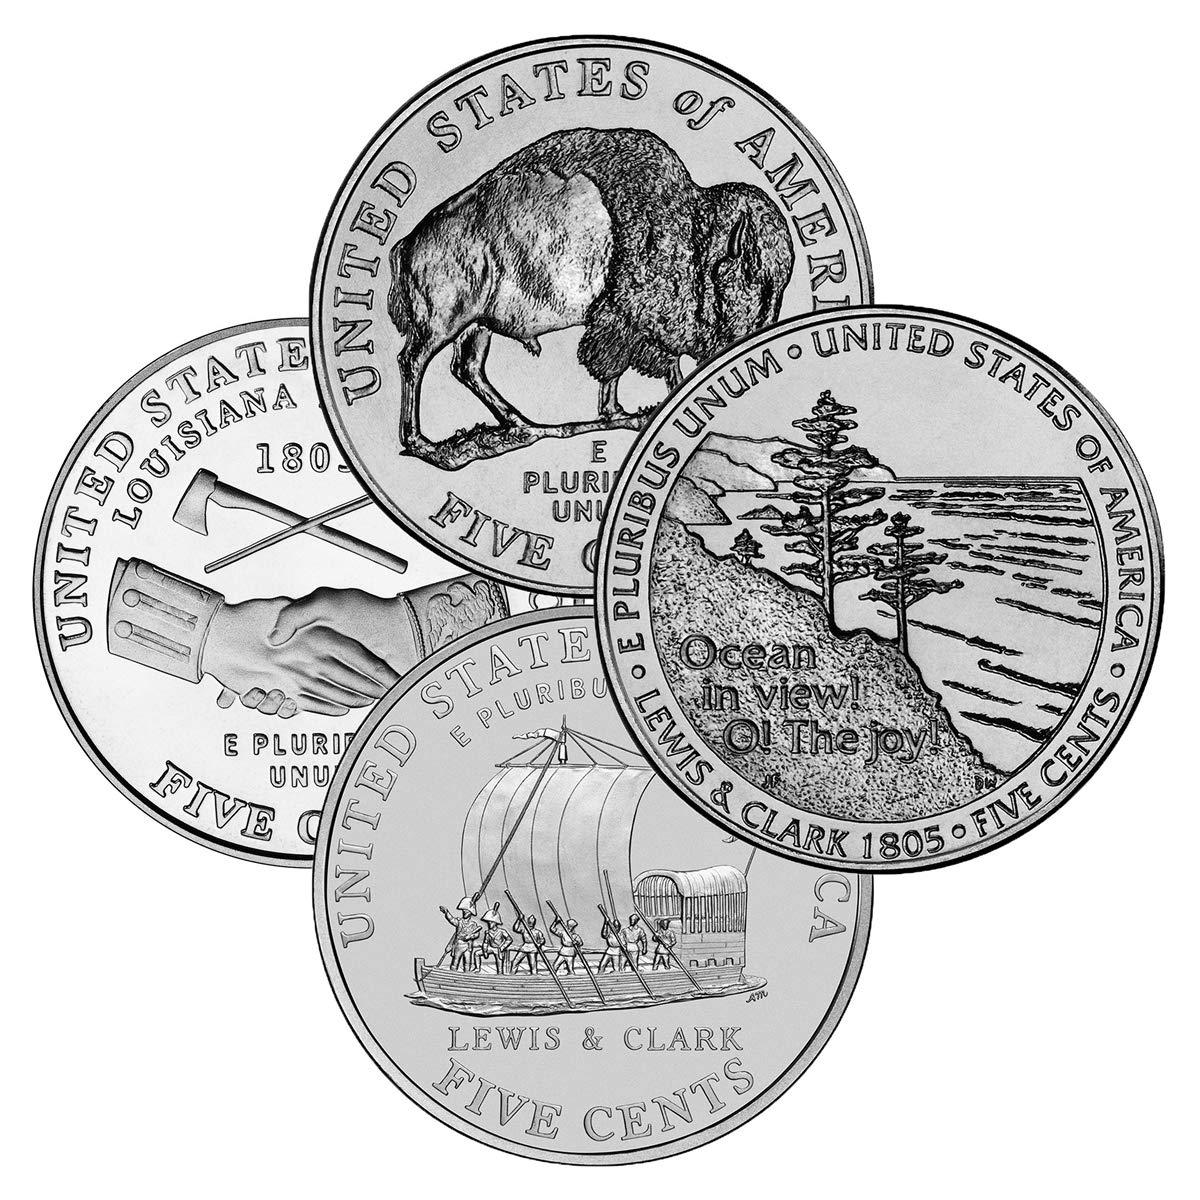 4-DENVER BRILLIANT UNCIRCULATED 2009 LINCOLN CENT 8-COIN SET 4-PHILADELPHIA